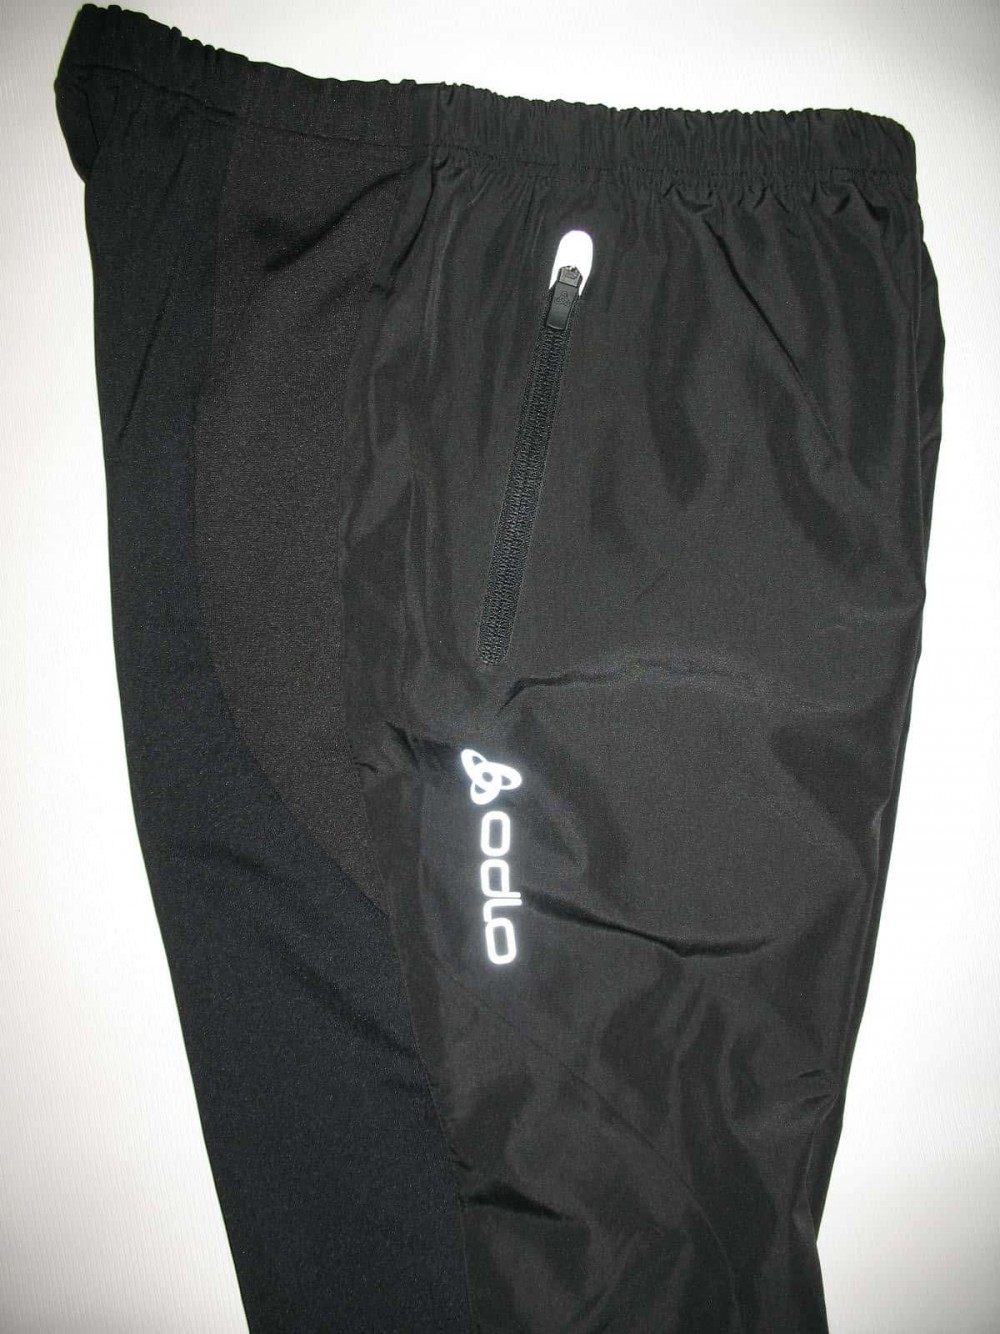 Штаны ODLO logic windproof pants (размер M) - 3